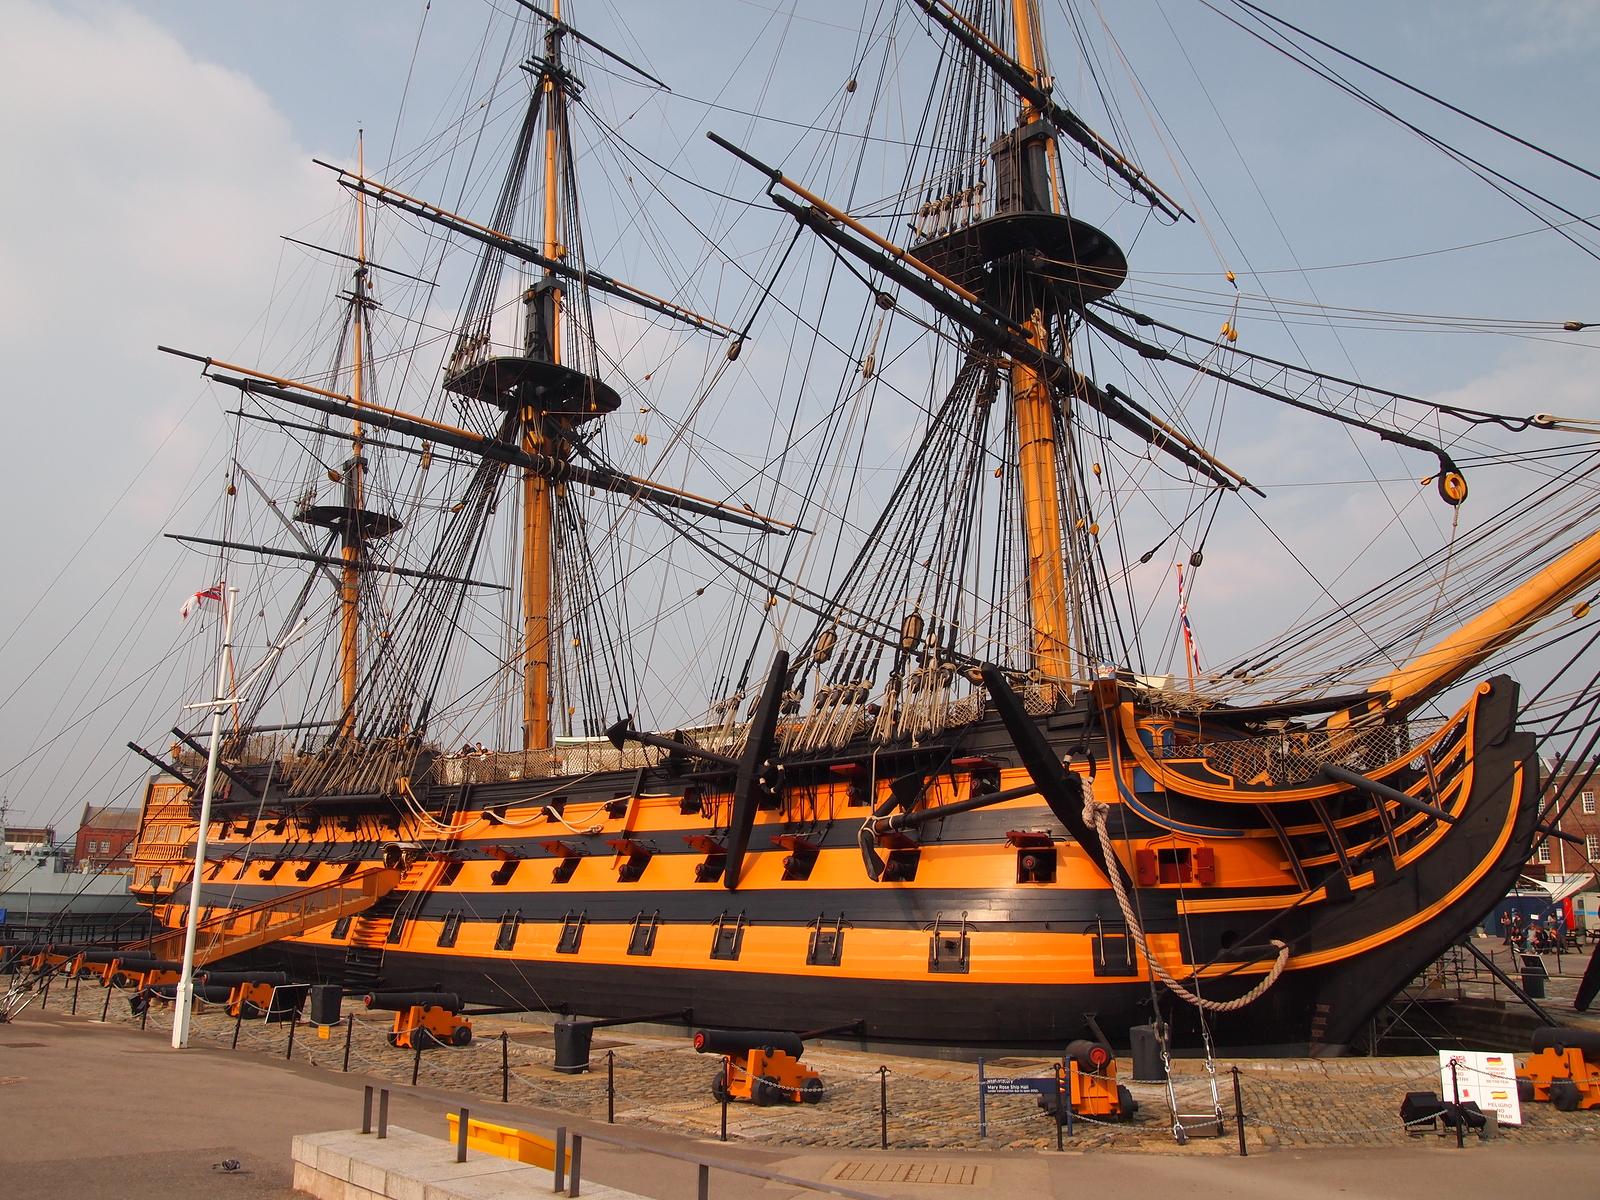 HMS Victory, Portsmouth Historic Dockyard